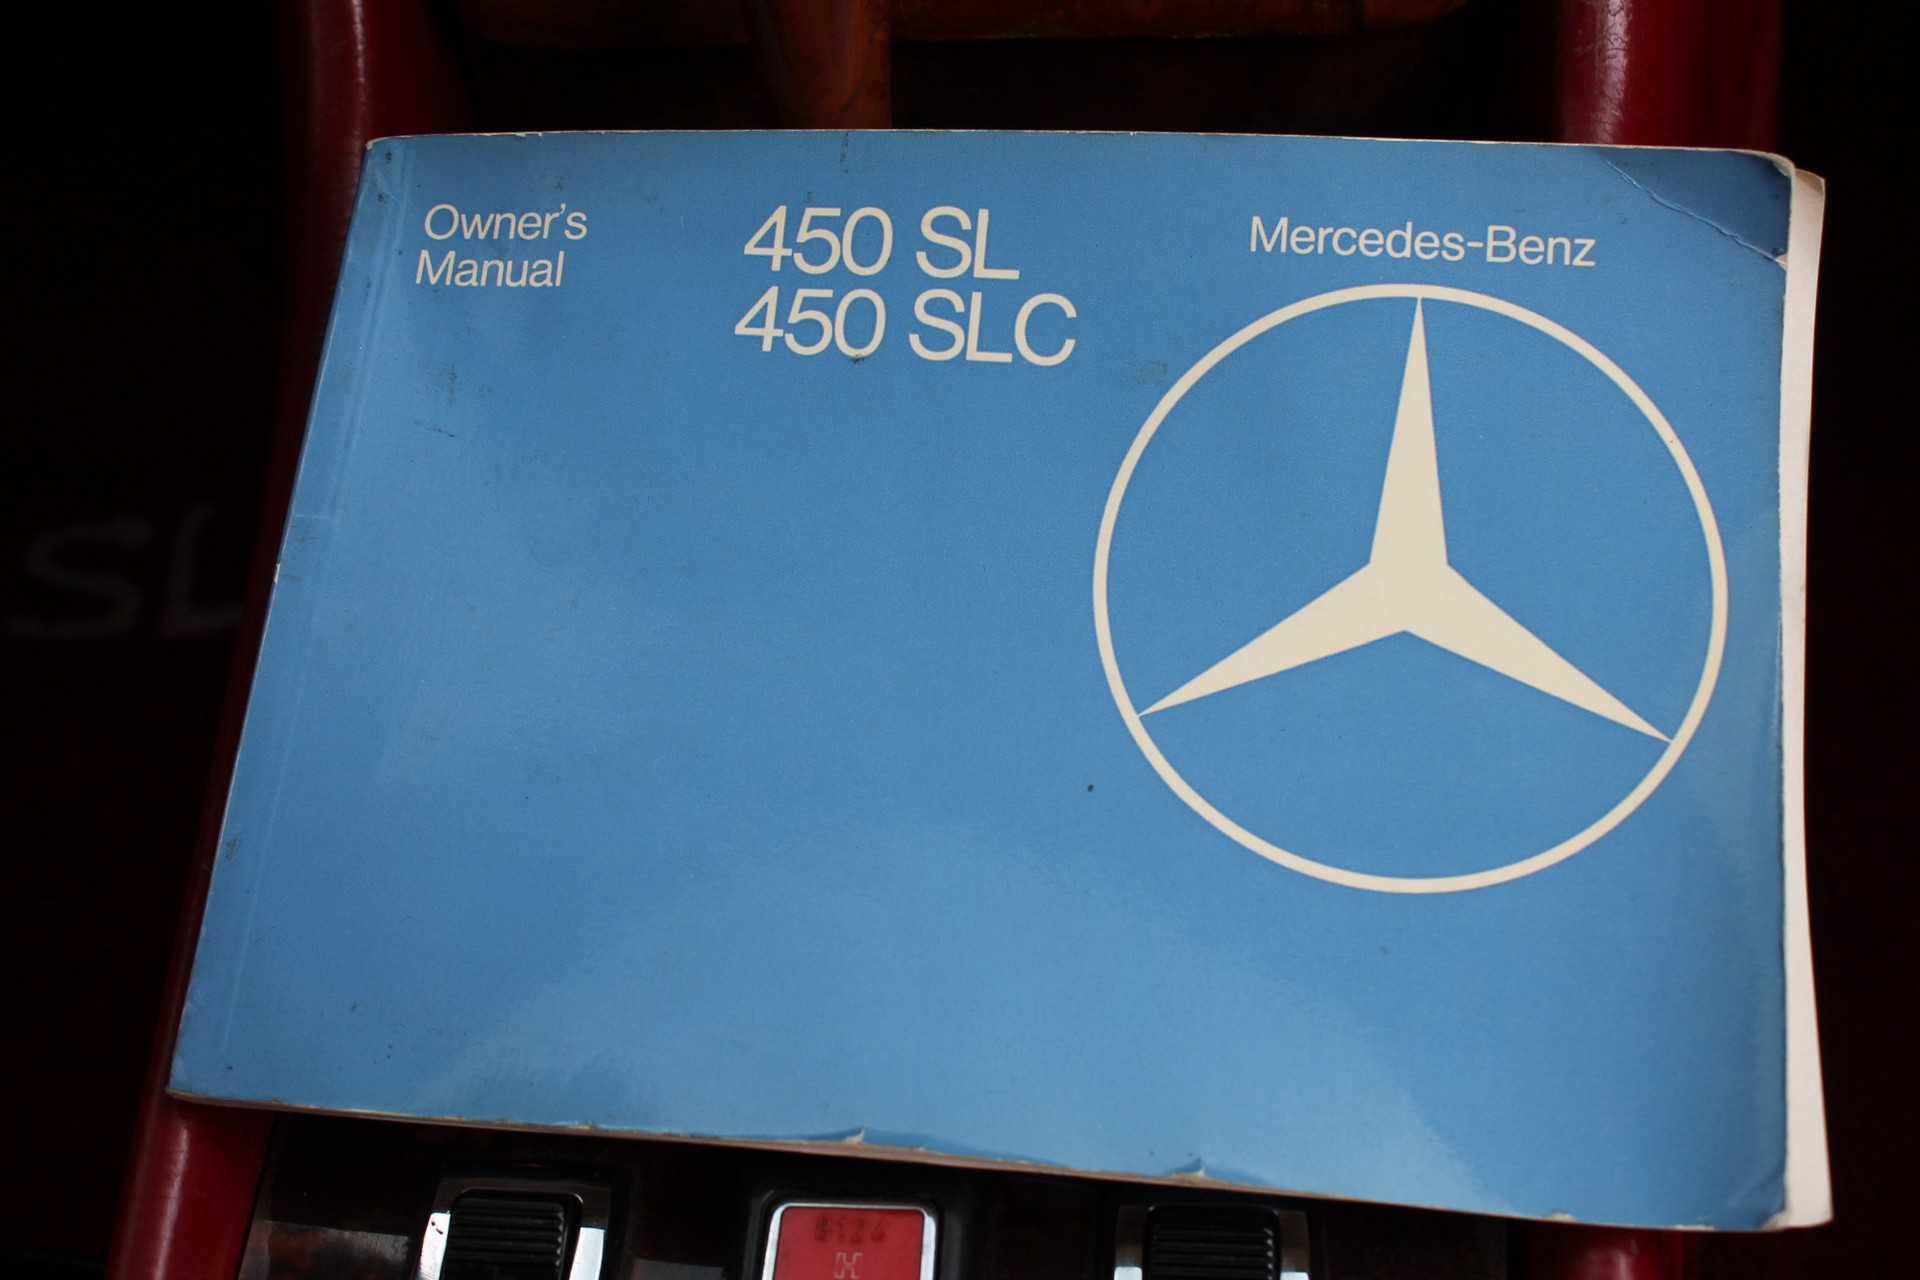 Mercedes-Benz SL-Klasse 450 SL roadster Foto 17